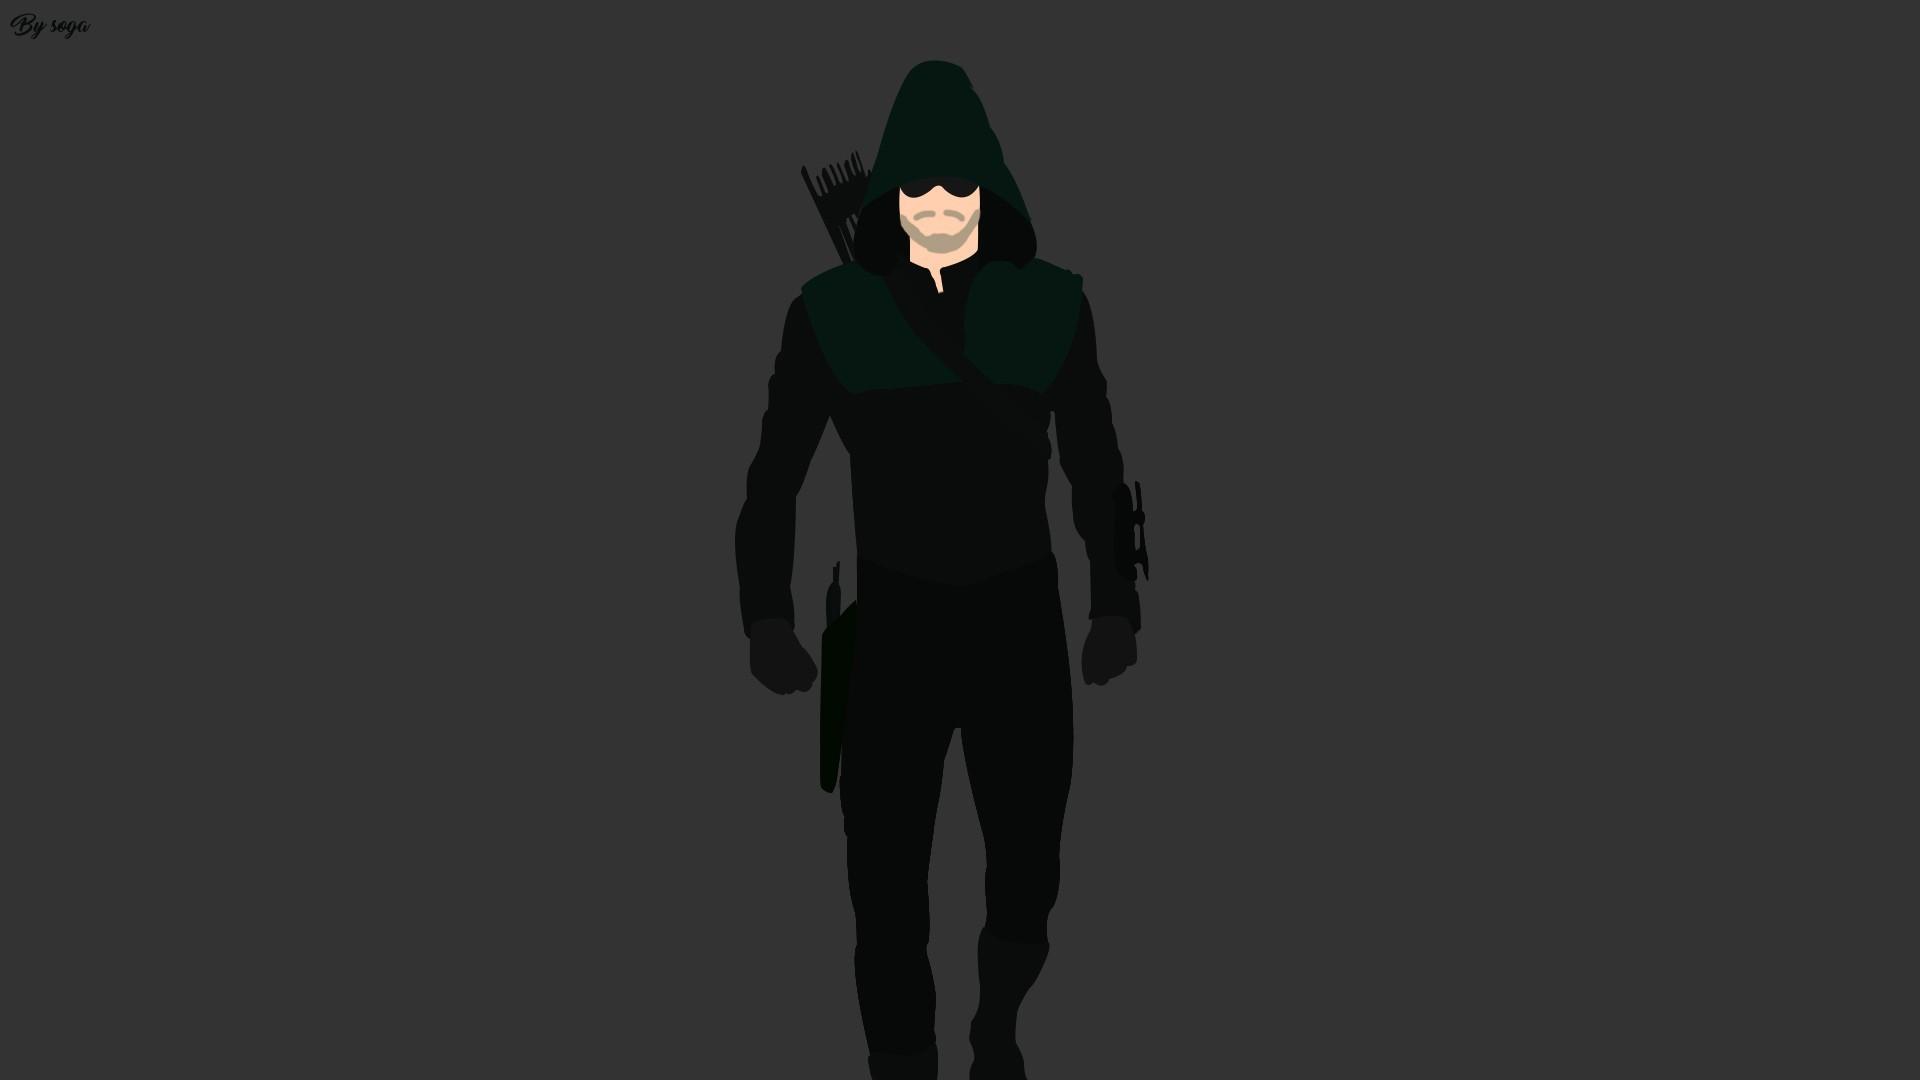 General Green Arrow DC Universe Arrow (TV series) vector